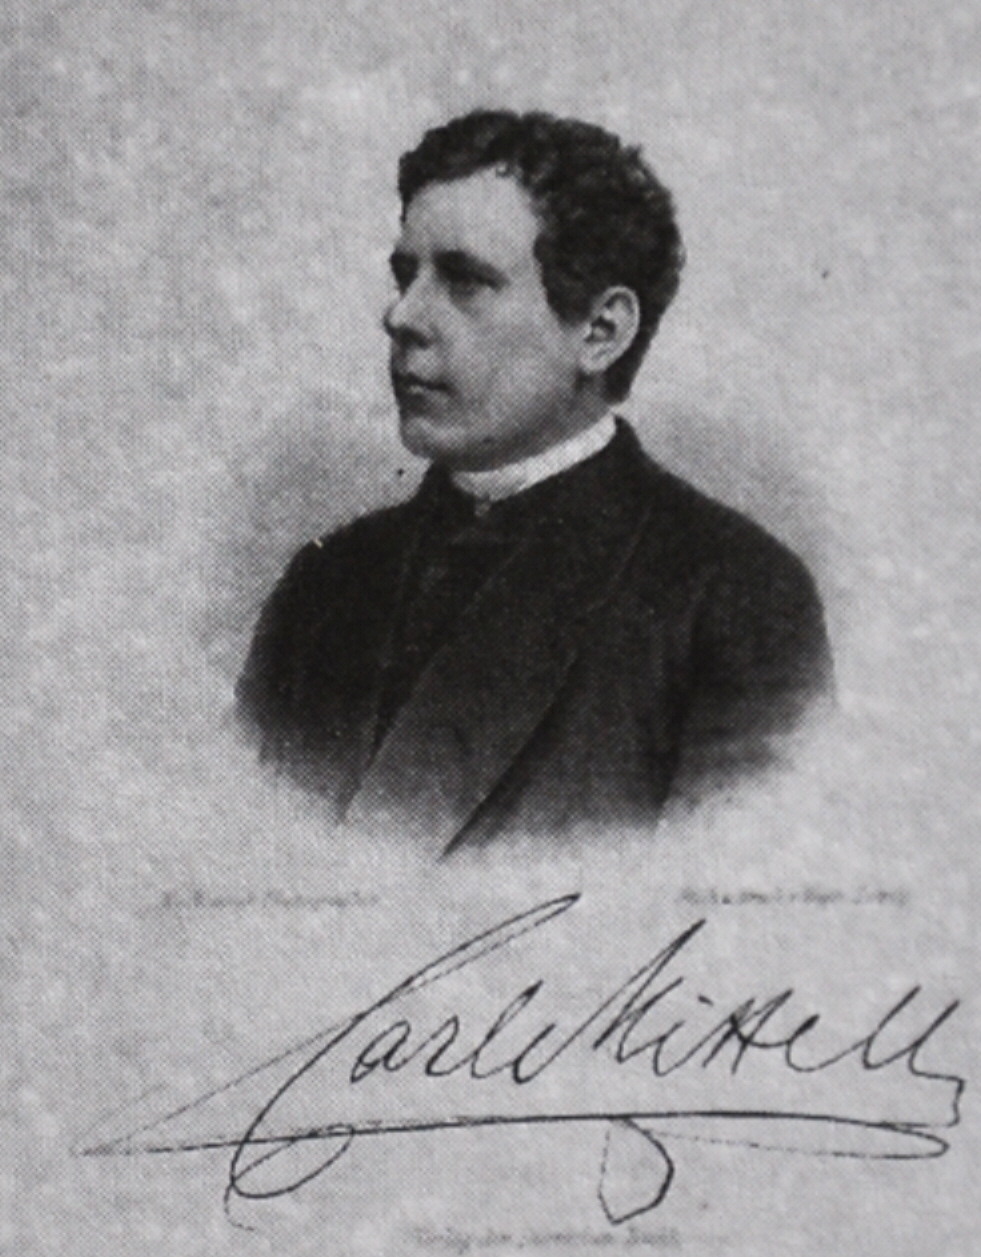 Carl Josef Mittell